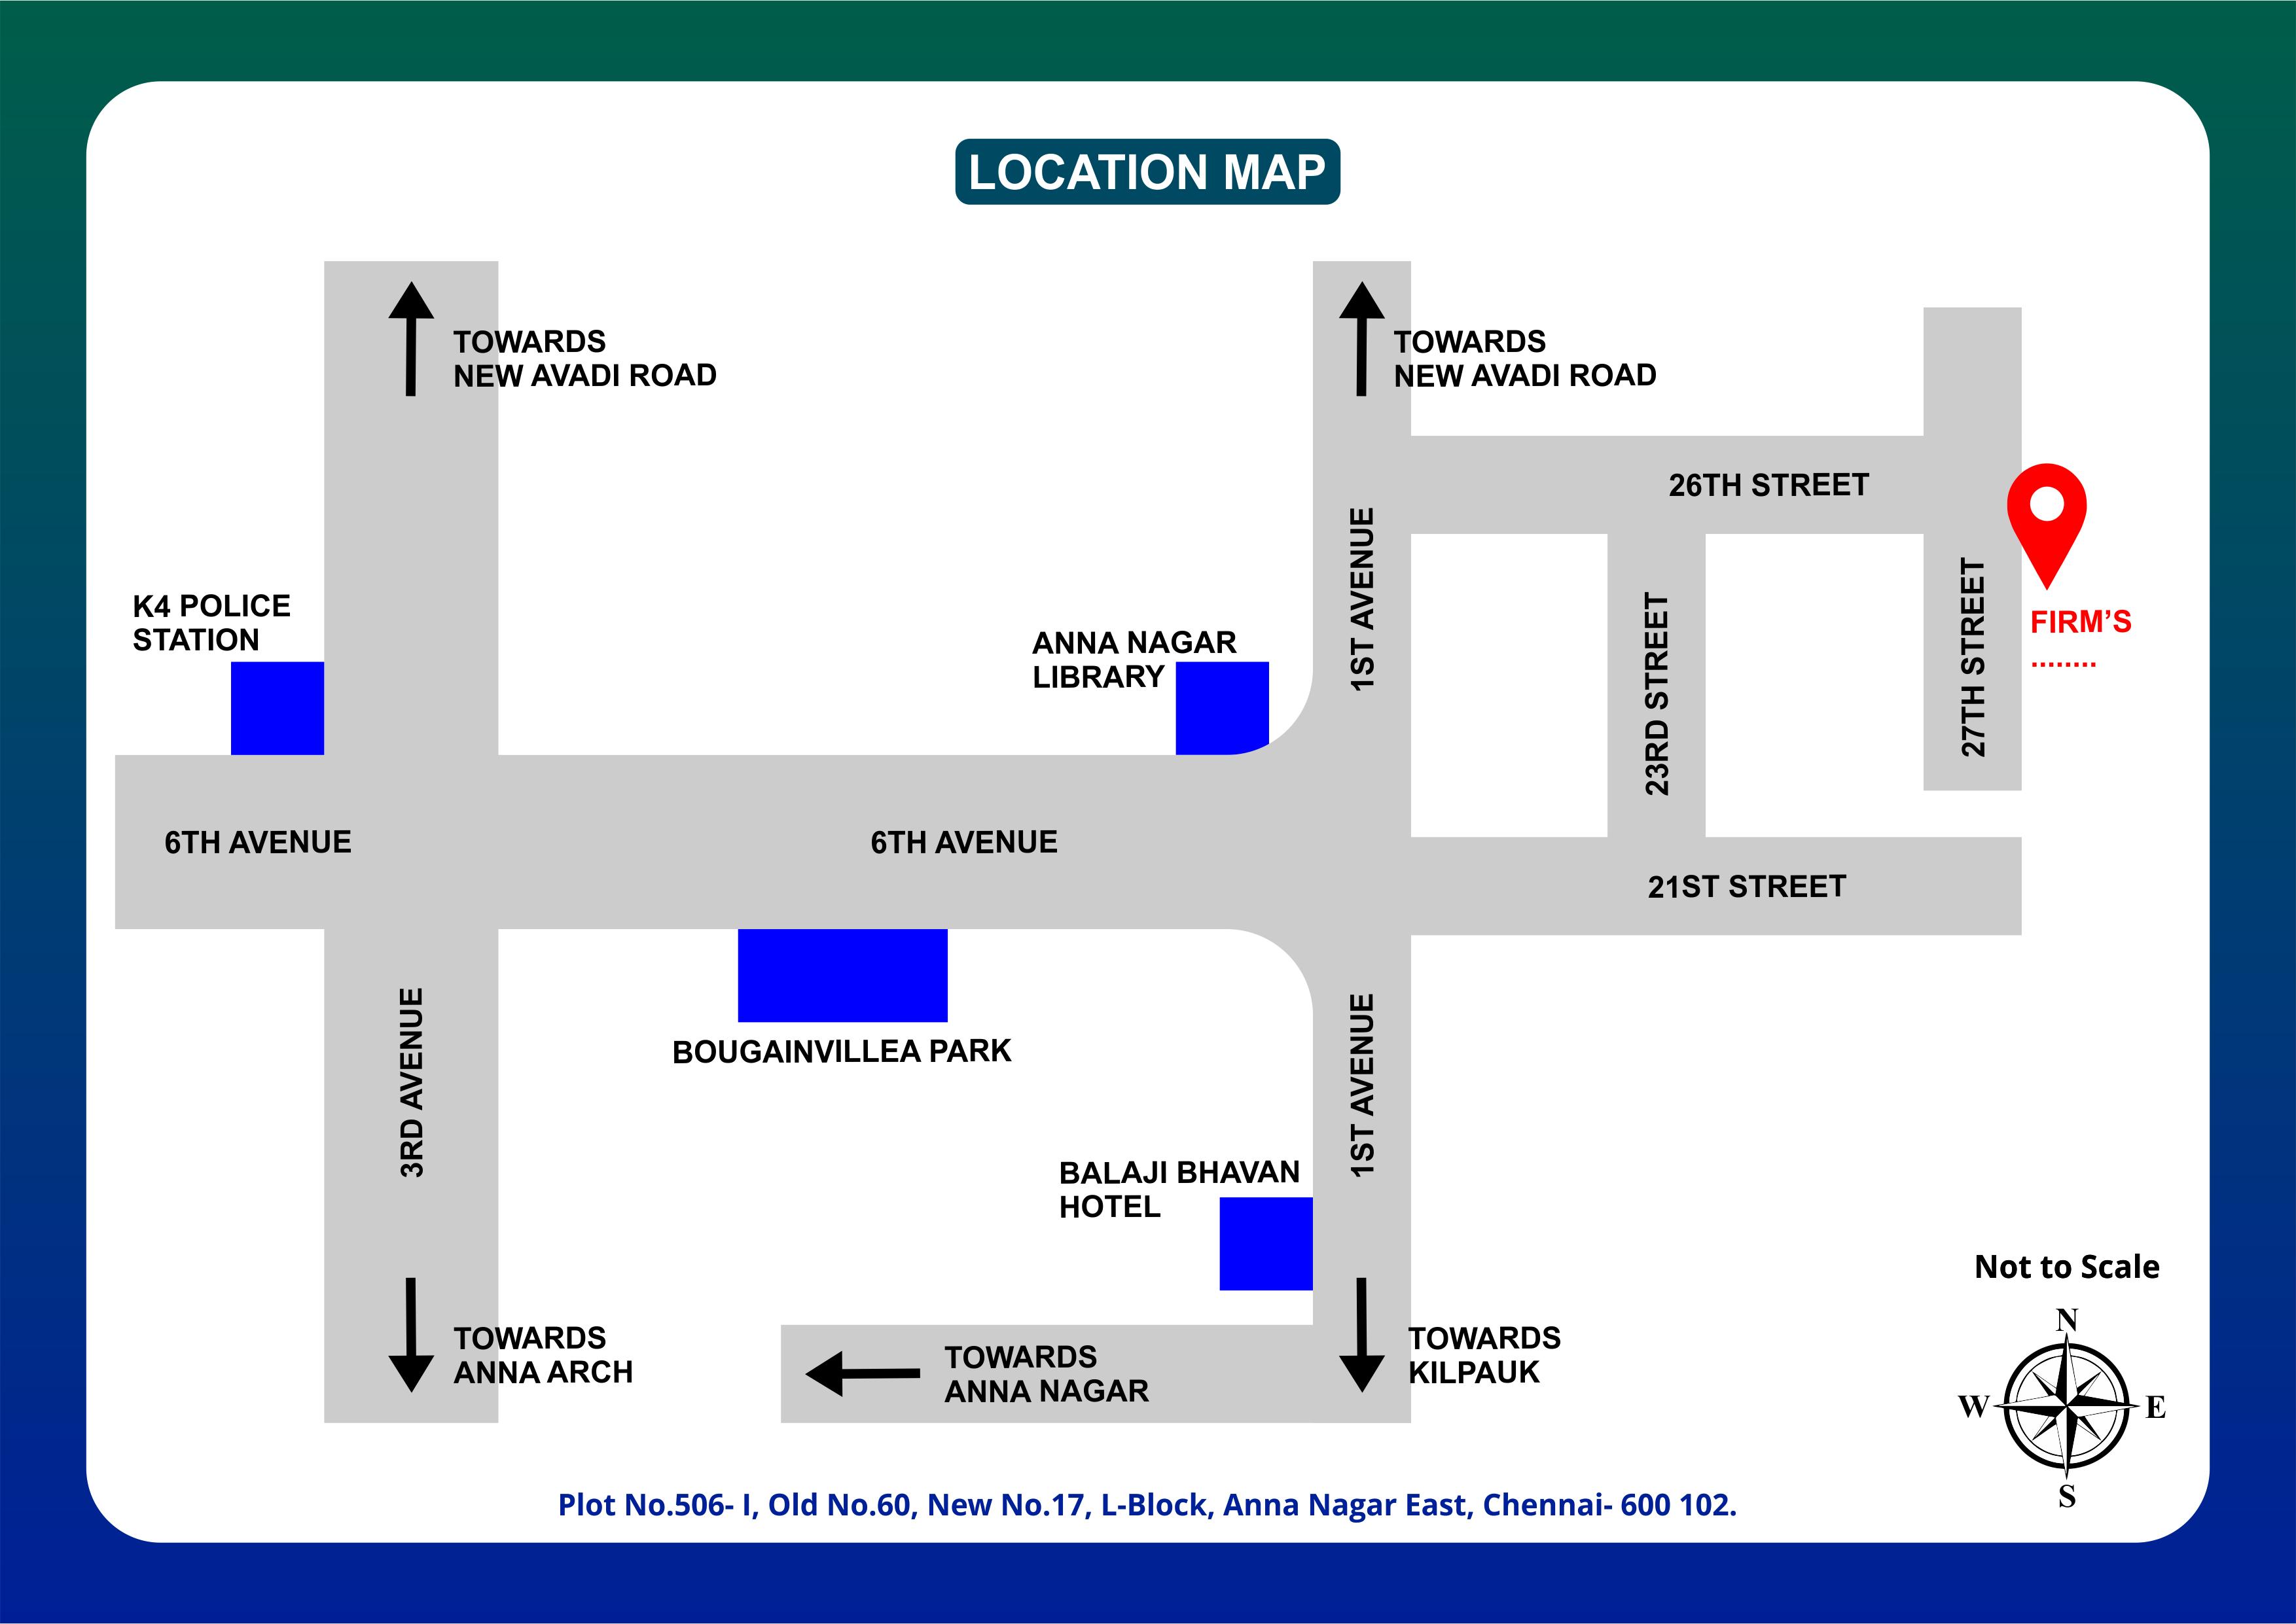 https://www.firmfoundations.in/projects/location/thumbnails/15699152988L_Block_Key_Plan.jpg